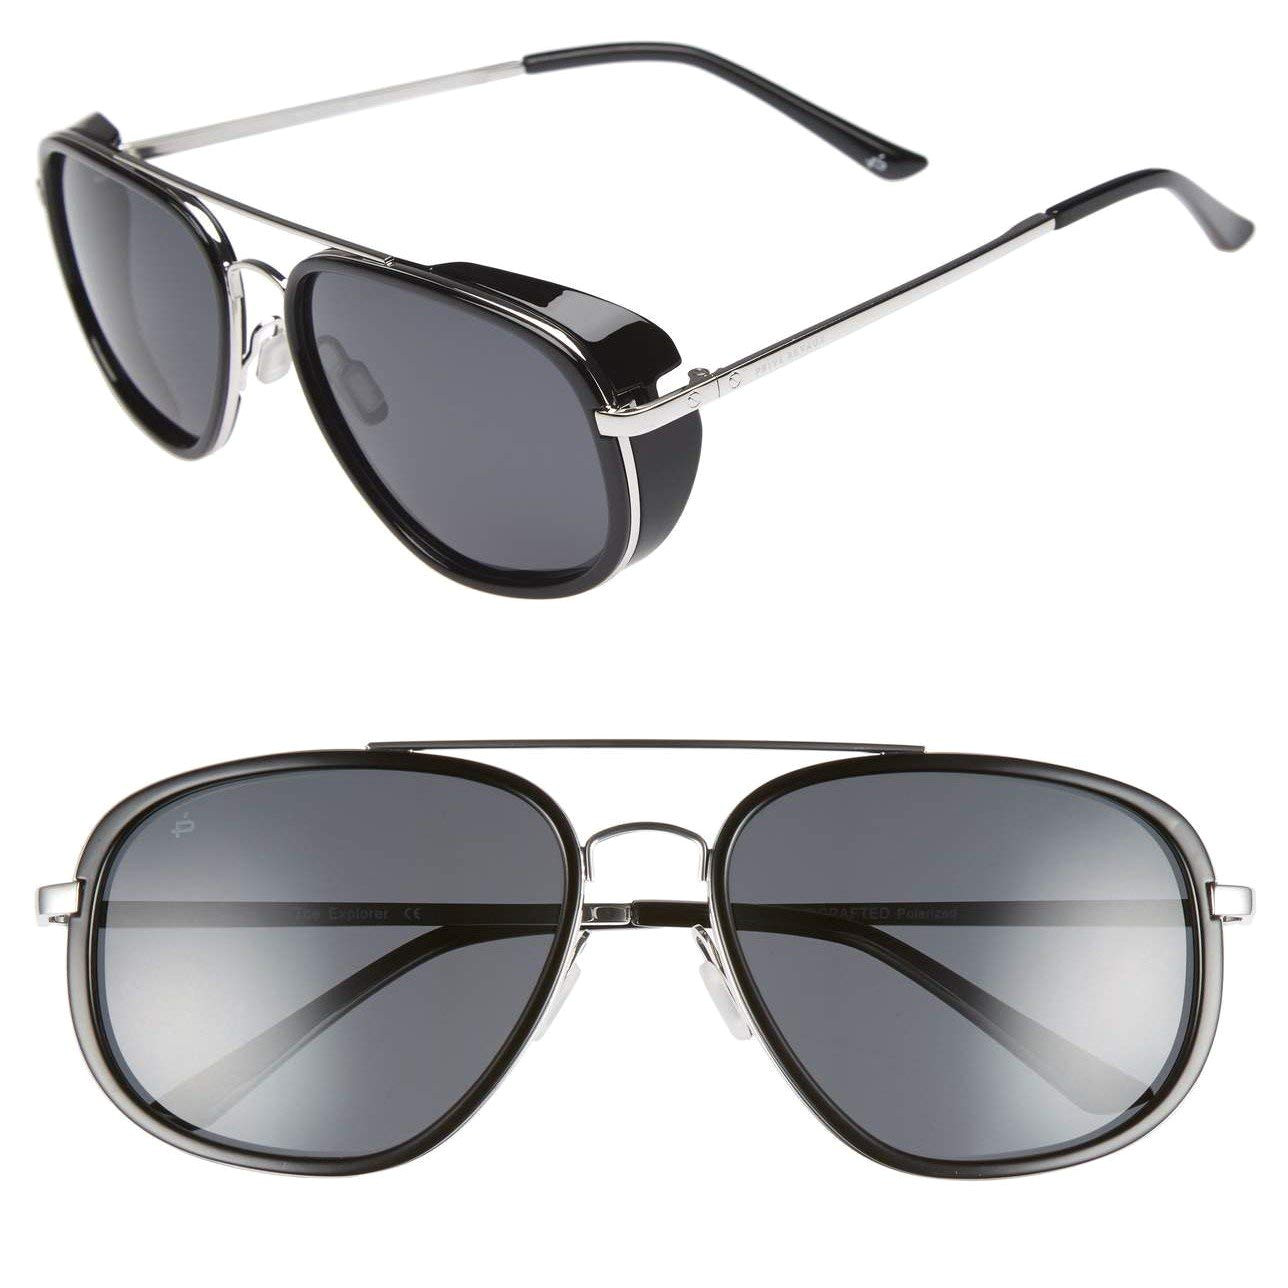 amazon com priva revaux the explorer handcrafted designer rider polarized sunglasses for men women clothing